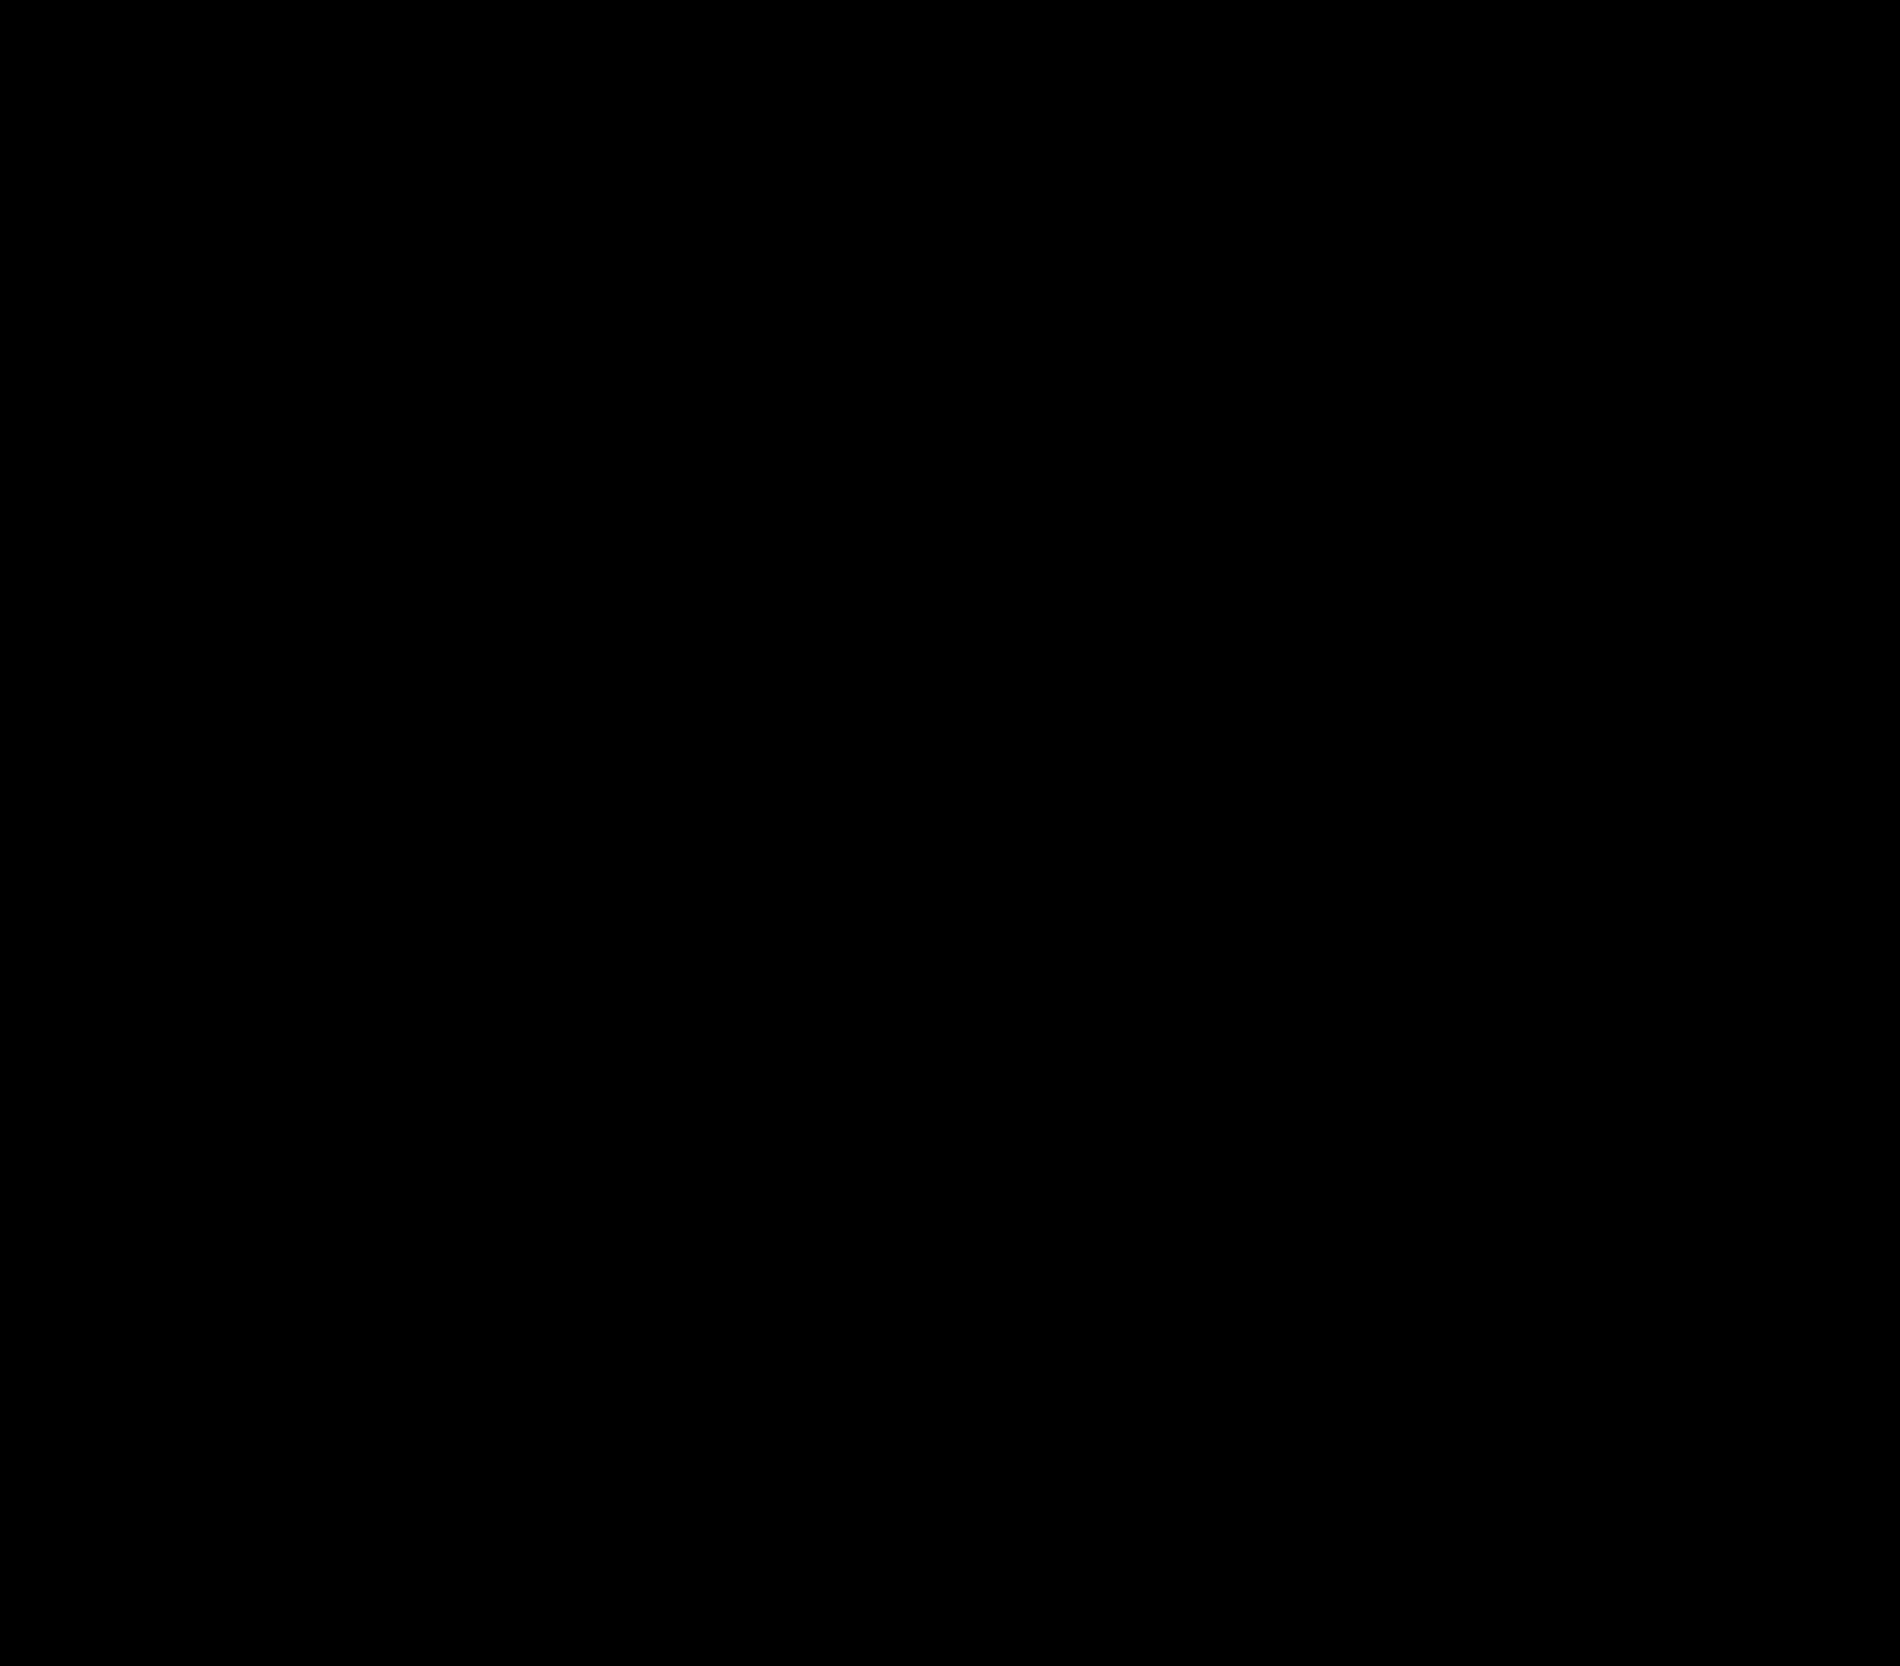 Anello labirinto